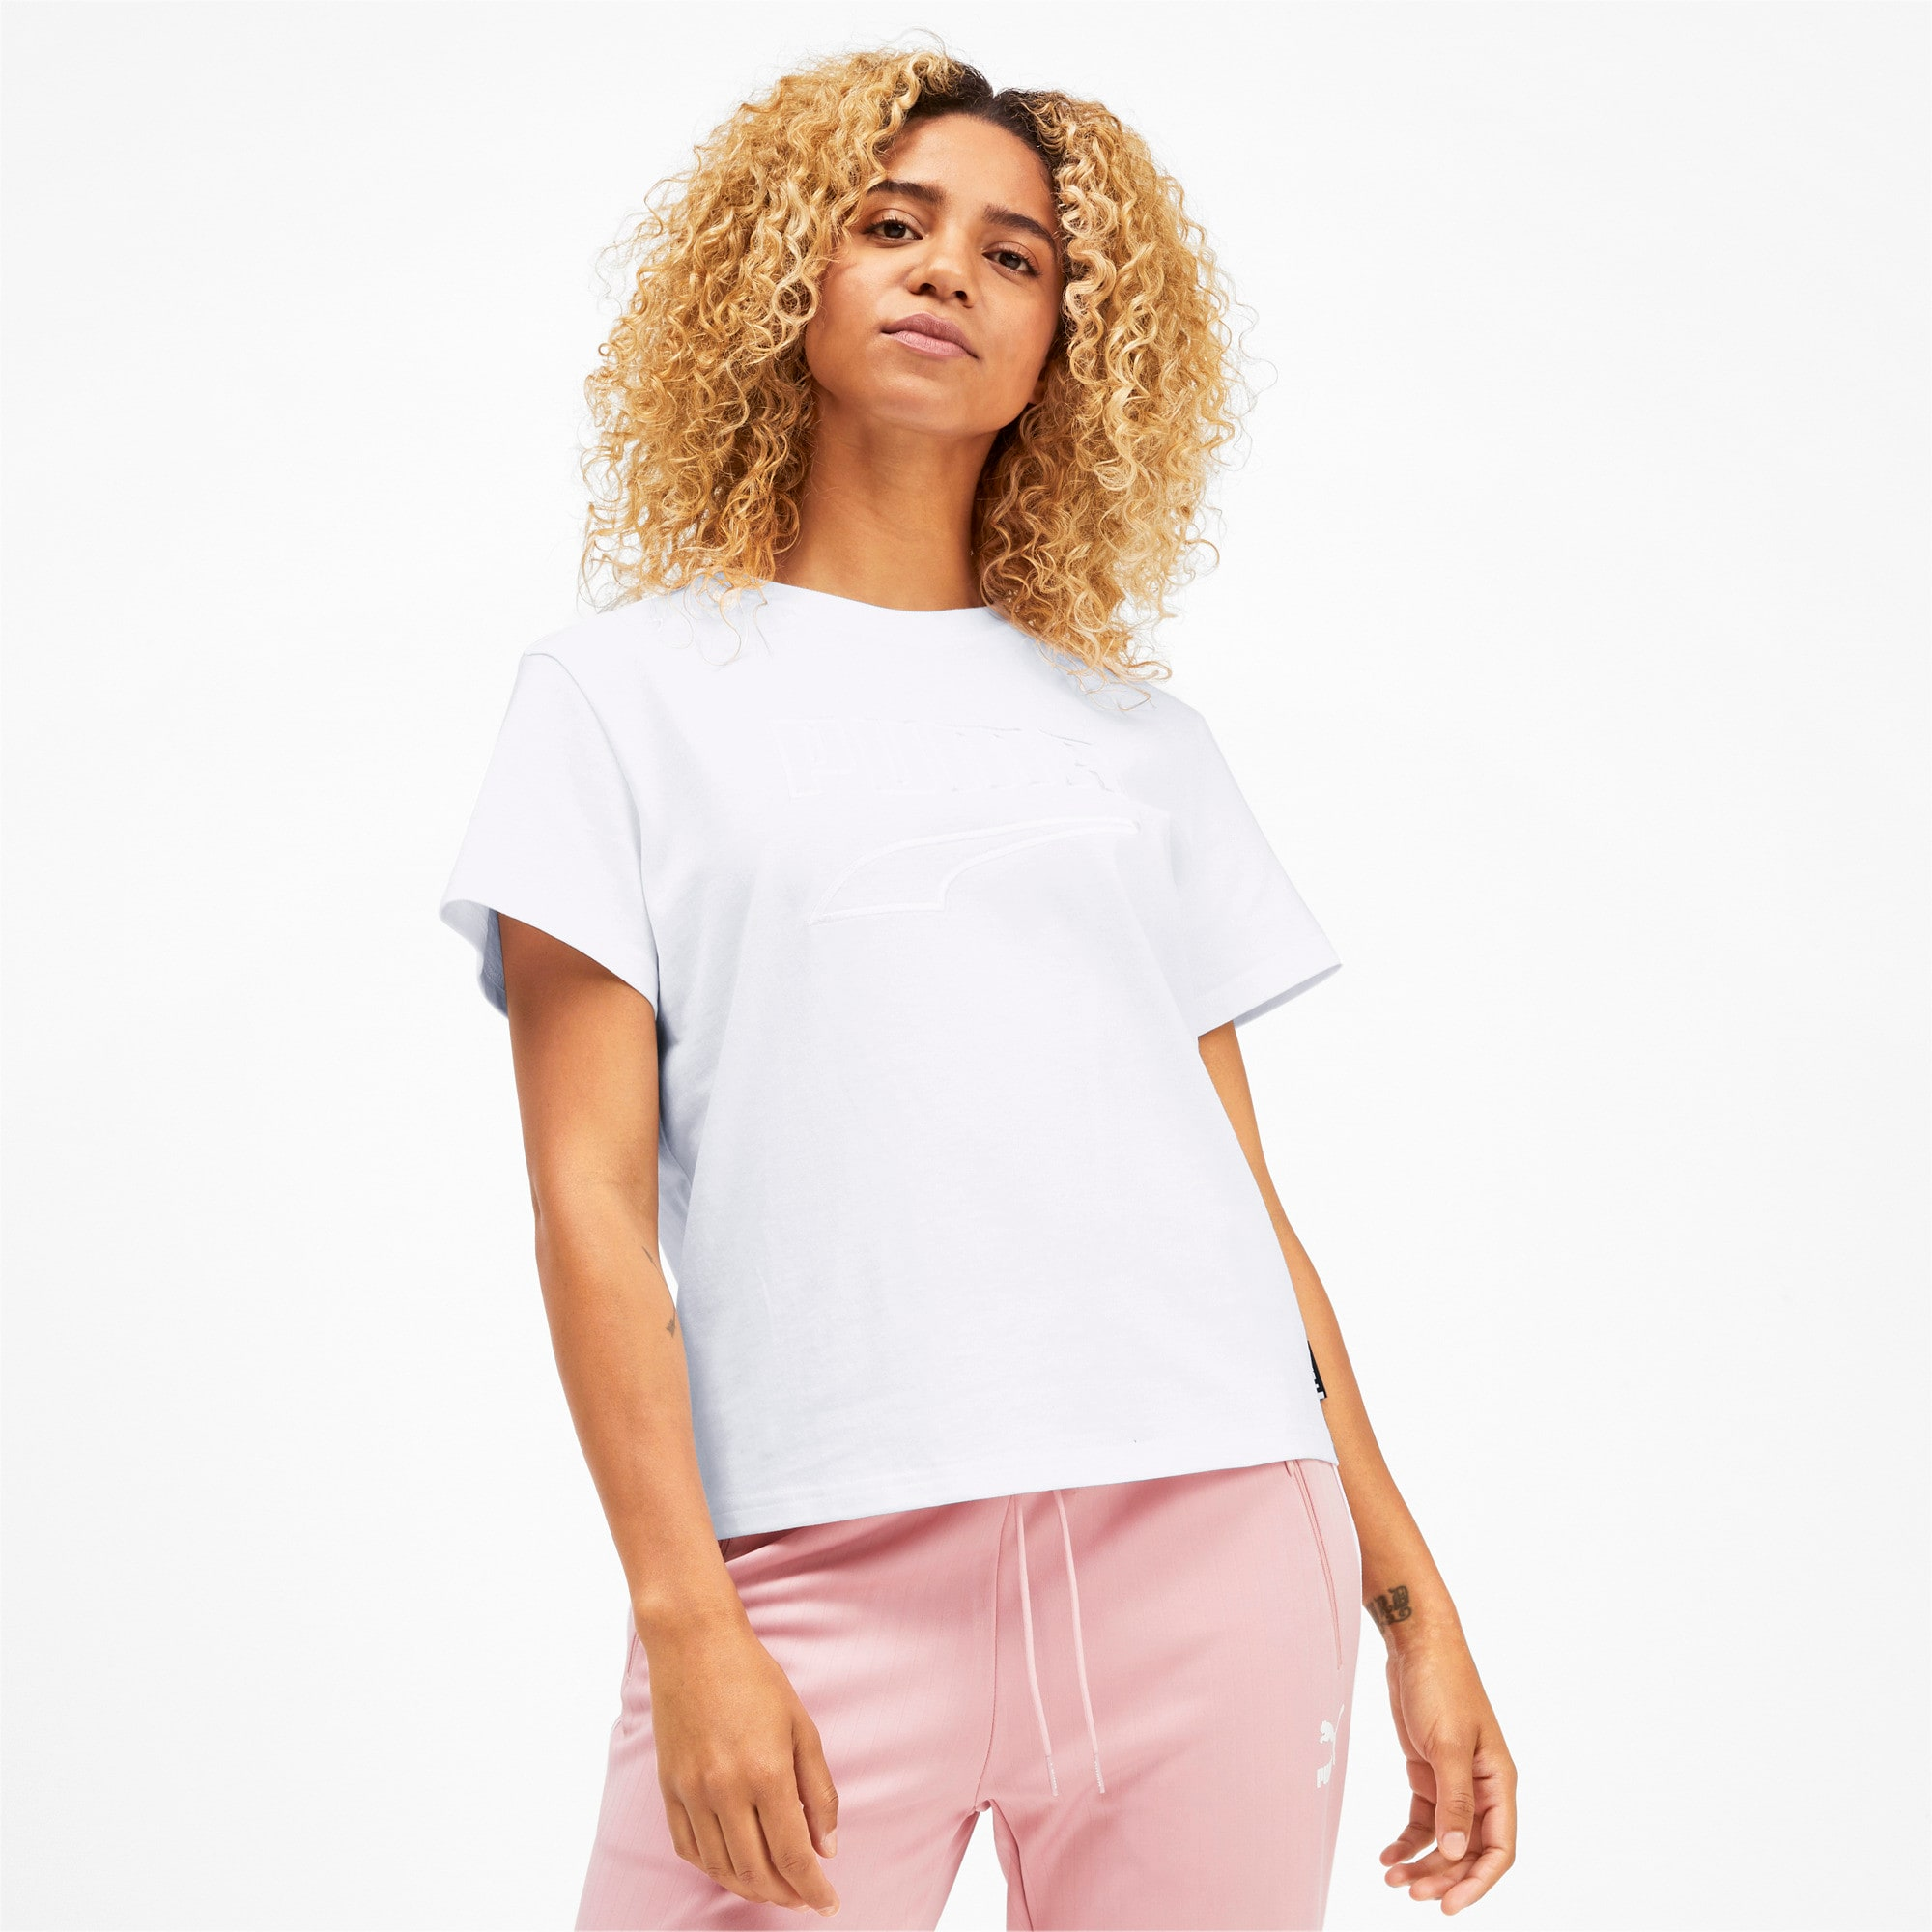 Miniatura 2 de CamisetaDowntown para mujer, Puma White, mediano